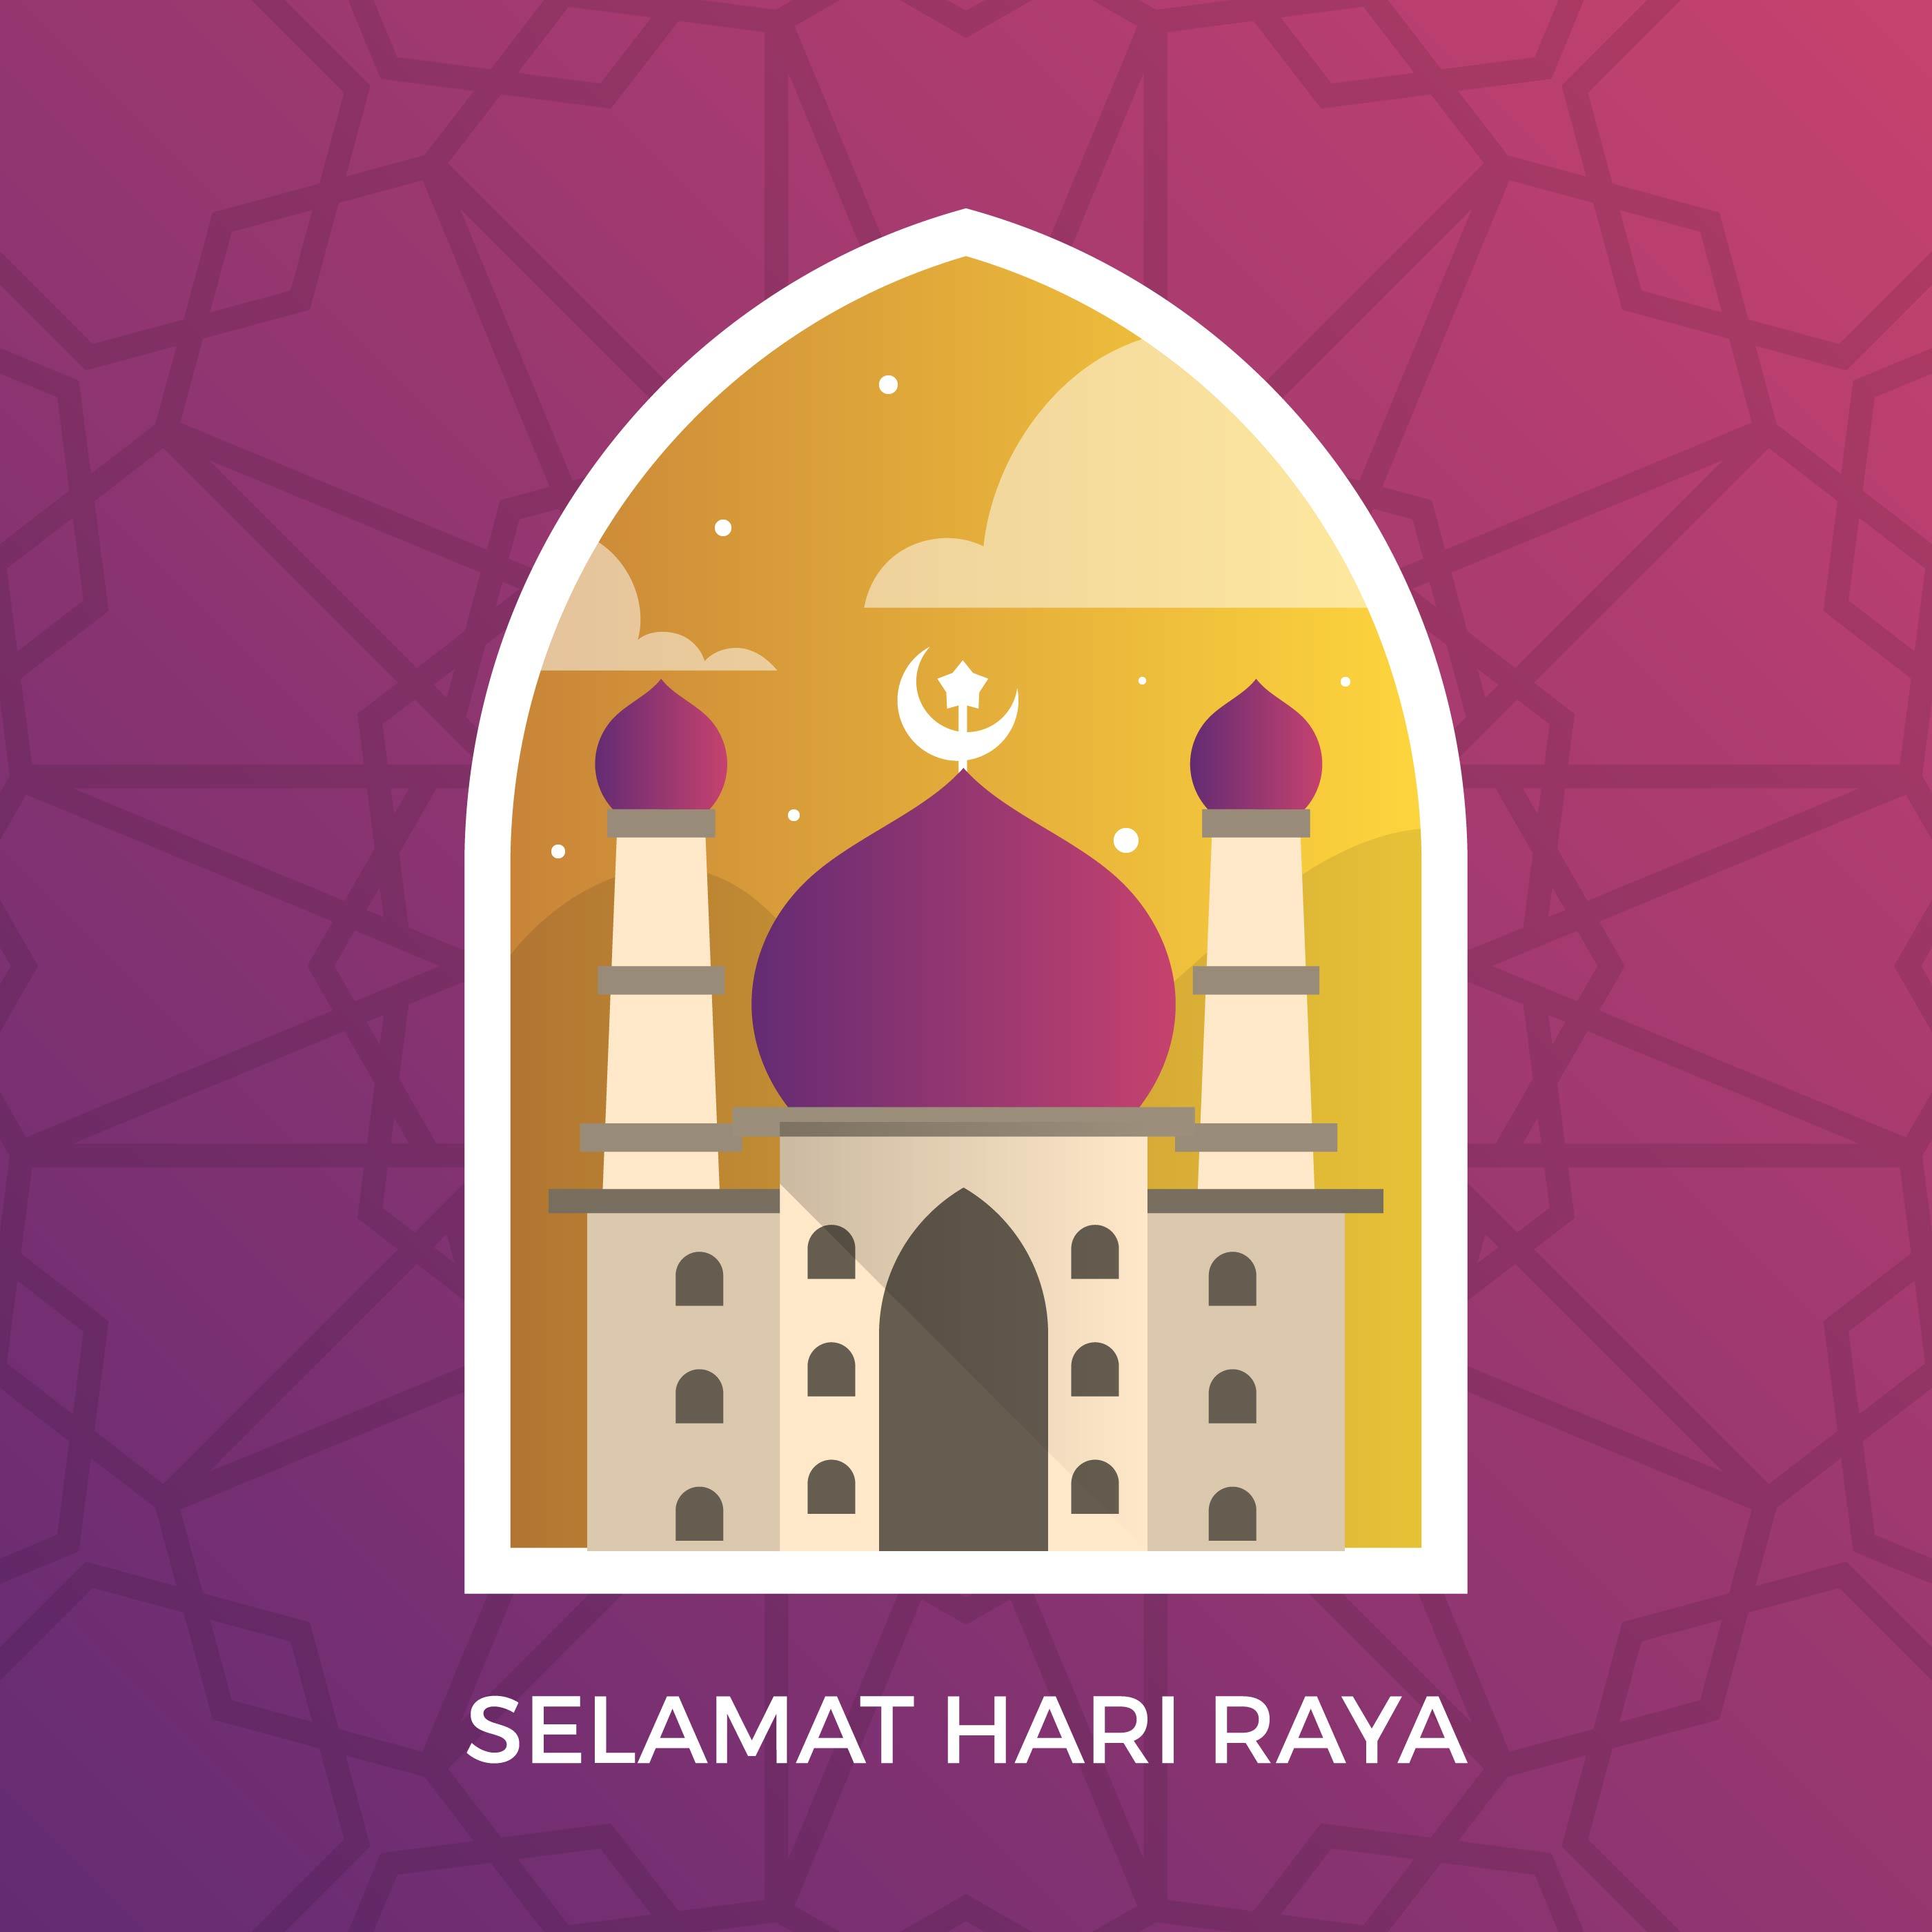 Modern Selamat Hari Raya Eid Mubarak Greetings Download Free Vectors Clipart Graphics Vector Art